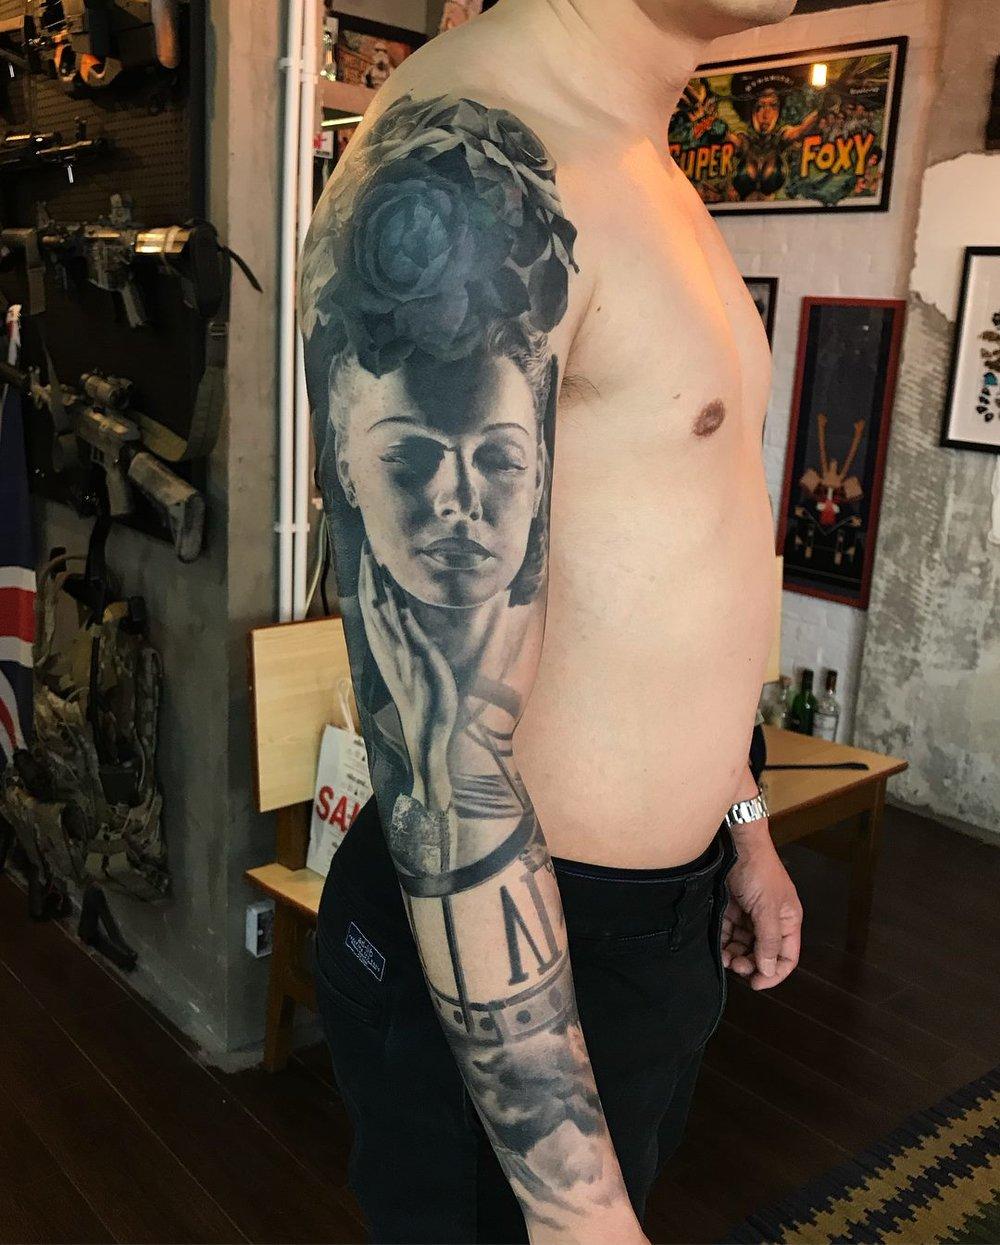 2018-fridays-tattoo-hong-kong-jamie-graphic-rose-cover-up-sleeve-2.jpg